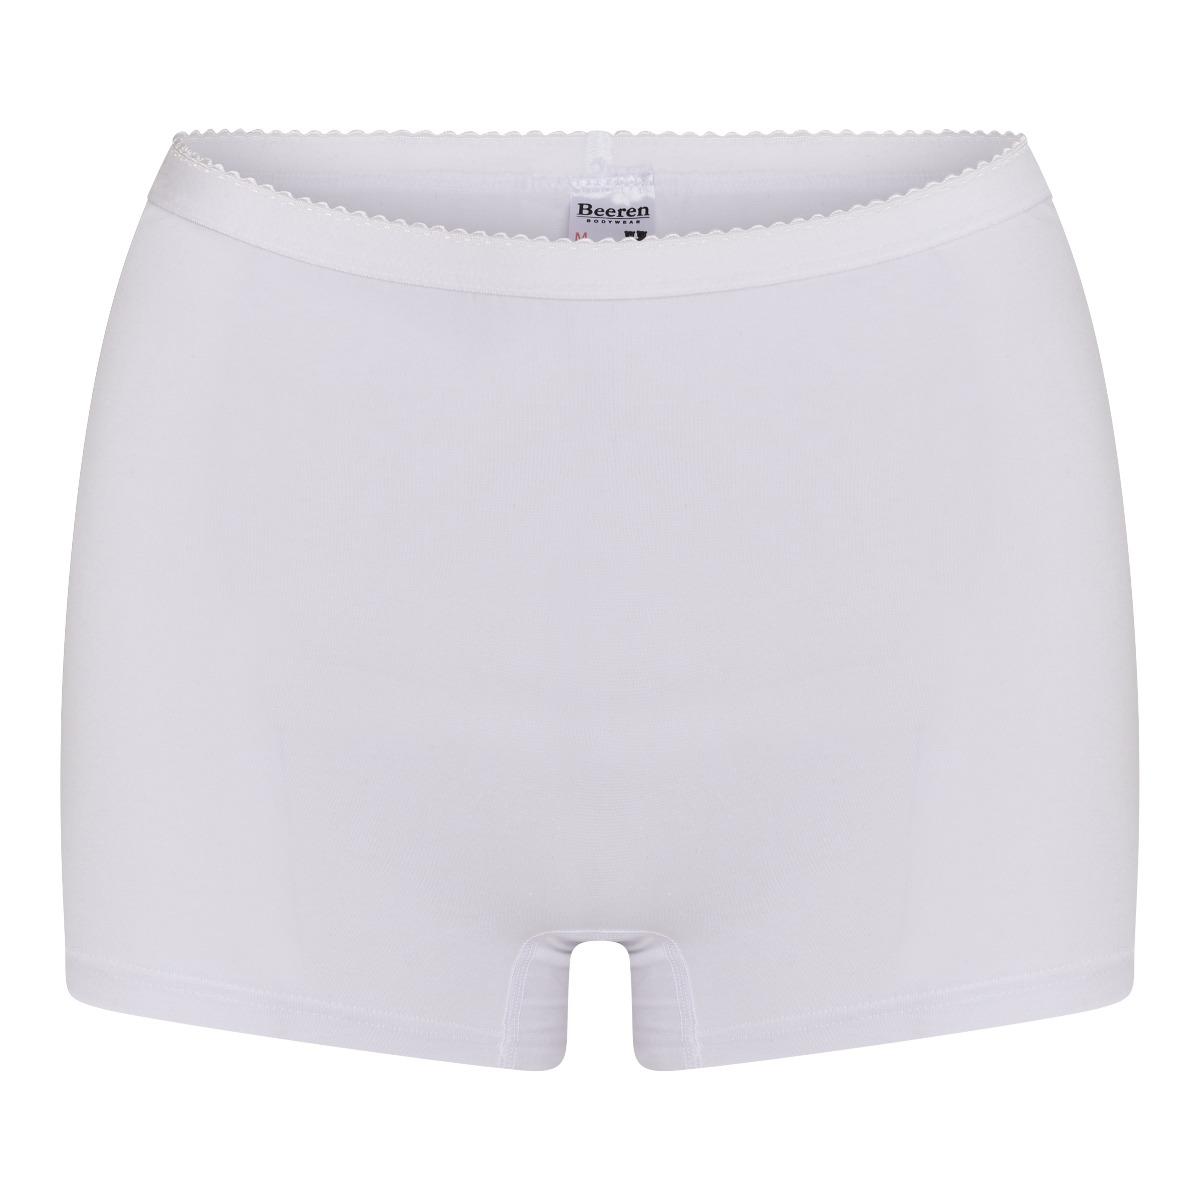 Beeren Softly Dames Panty Wit Xxl